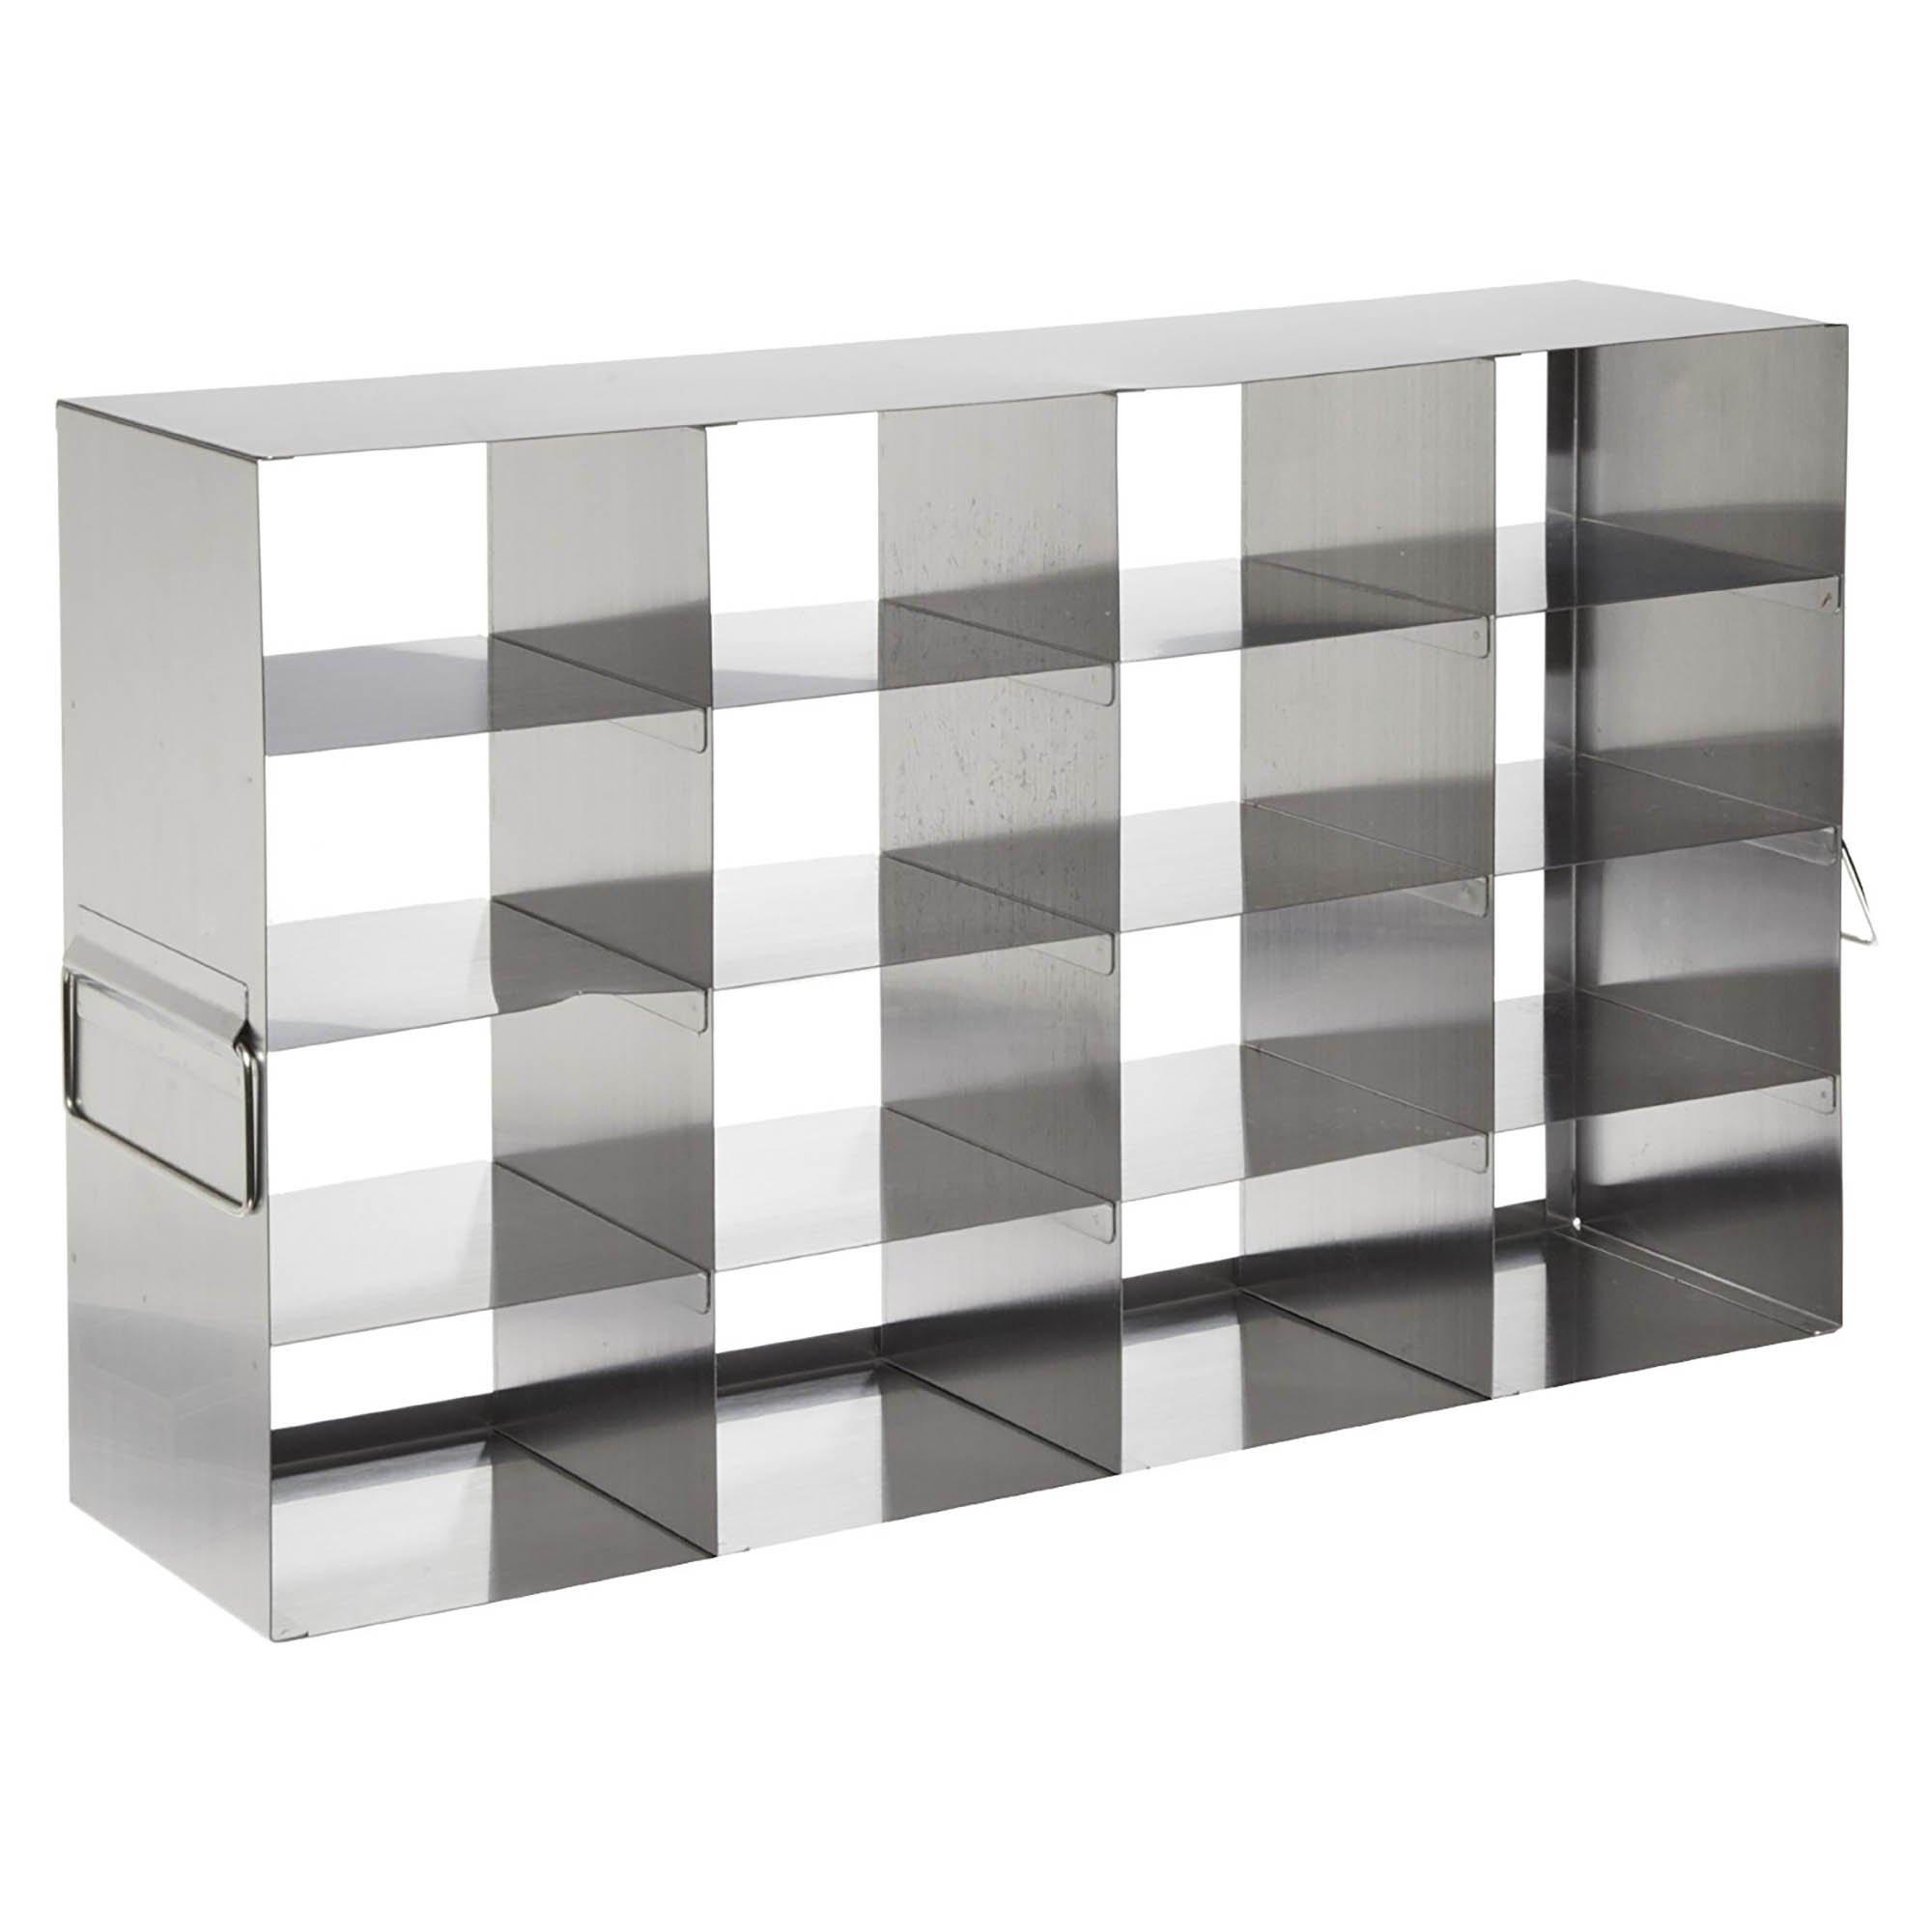 Horizontal Stainless Steel Freezer Rack For 3